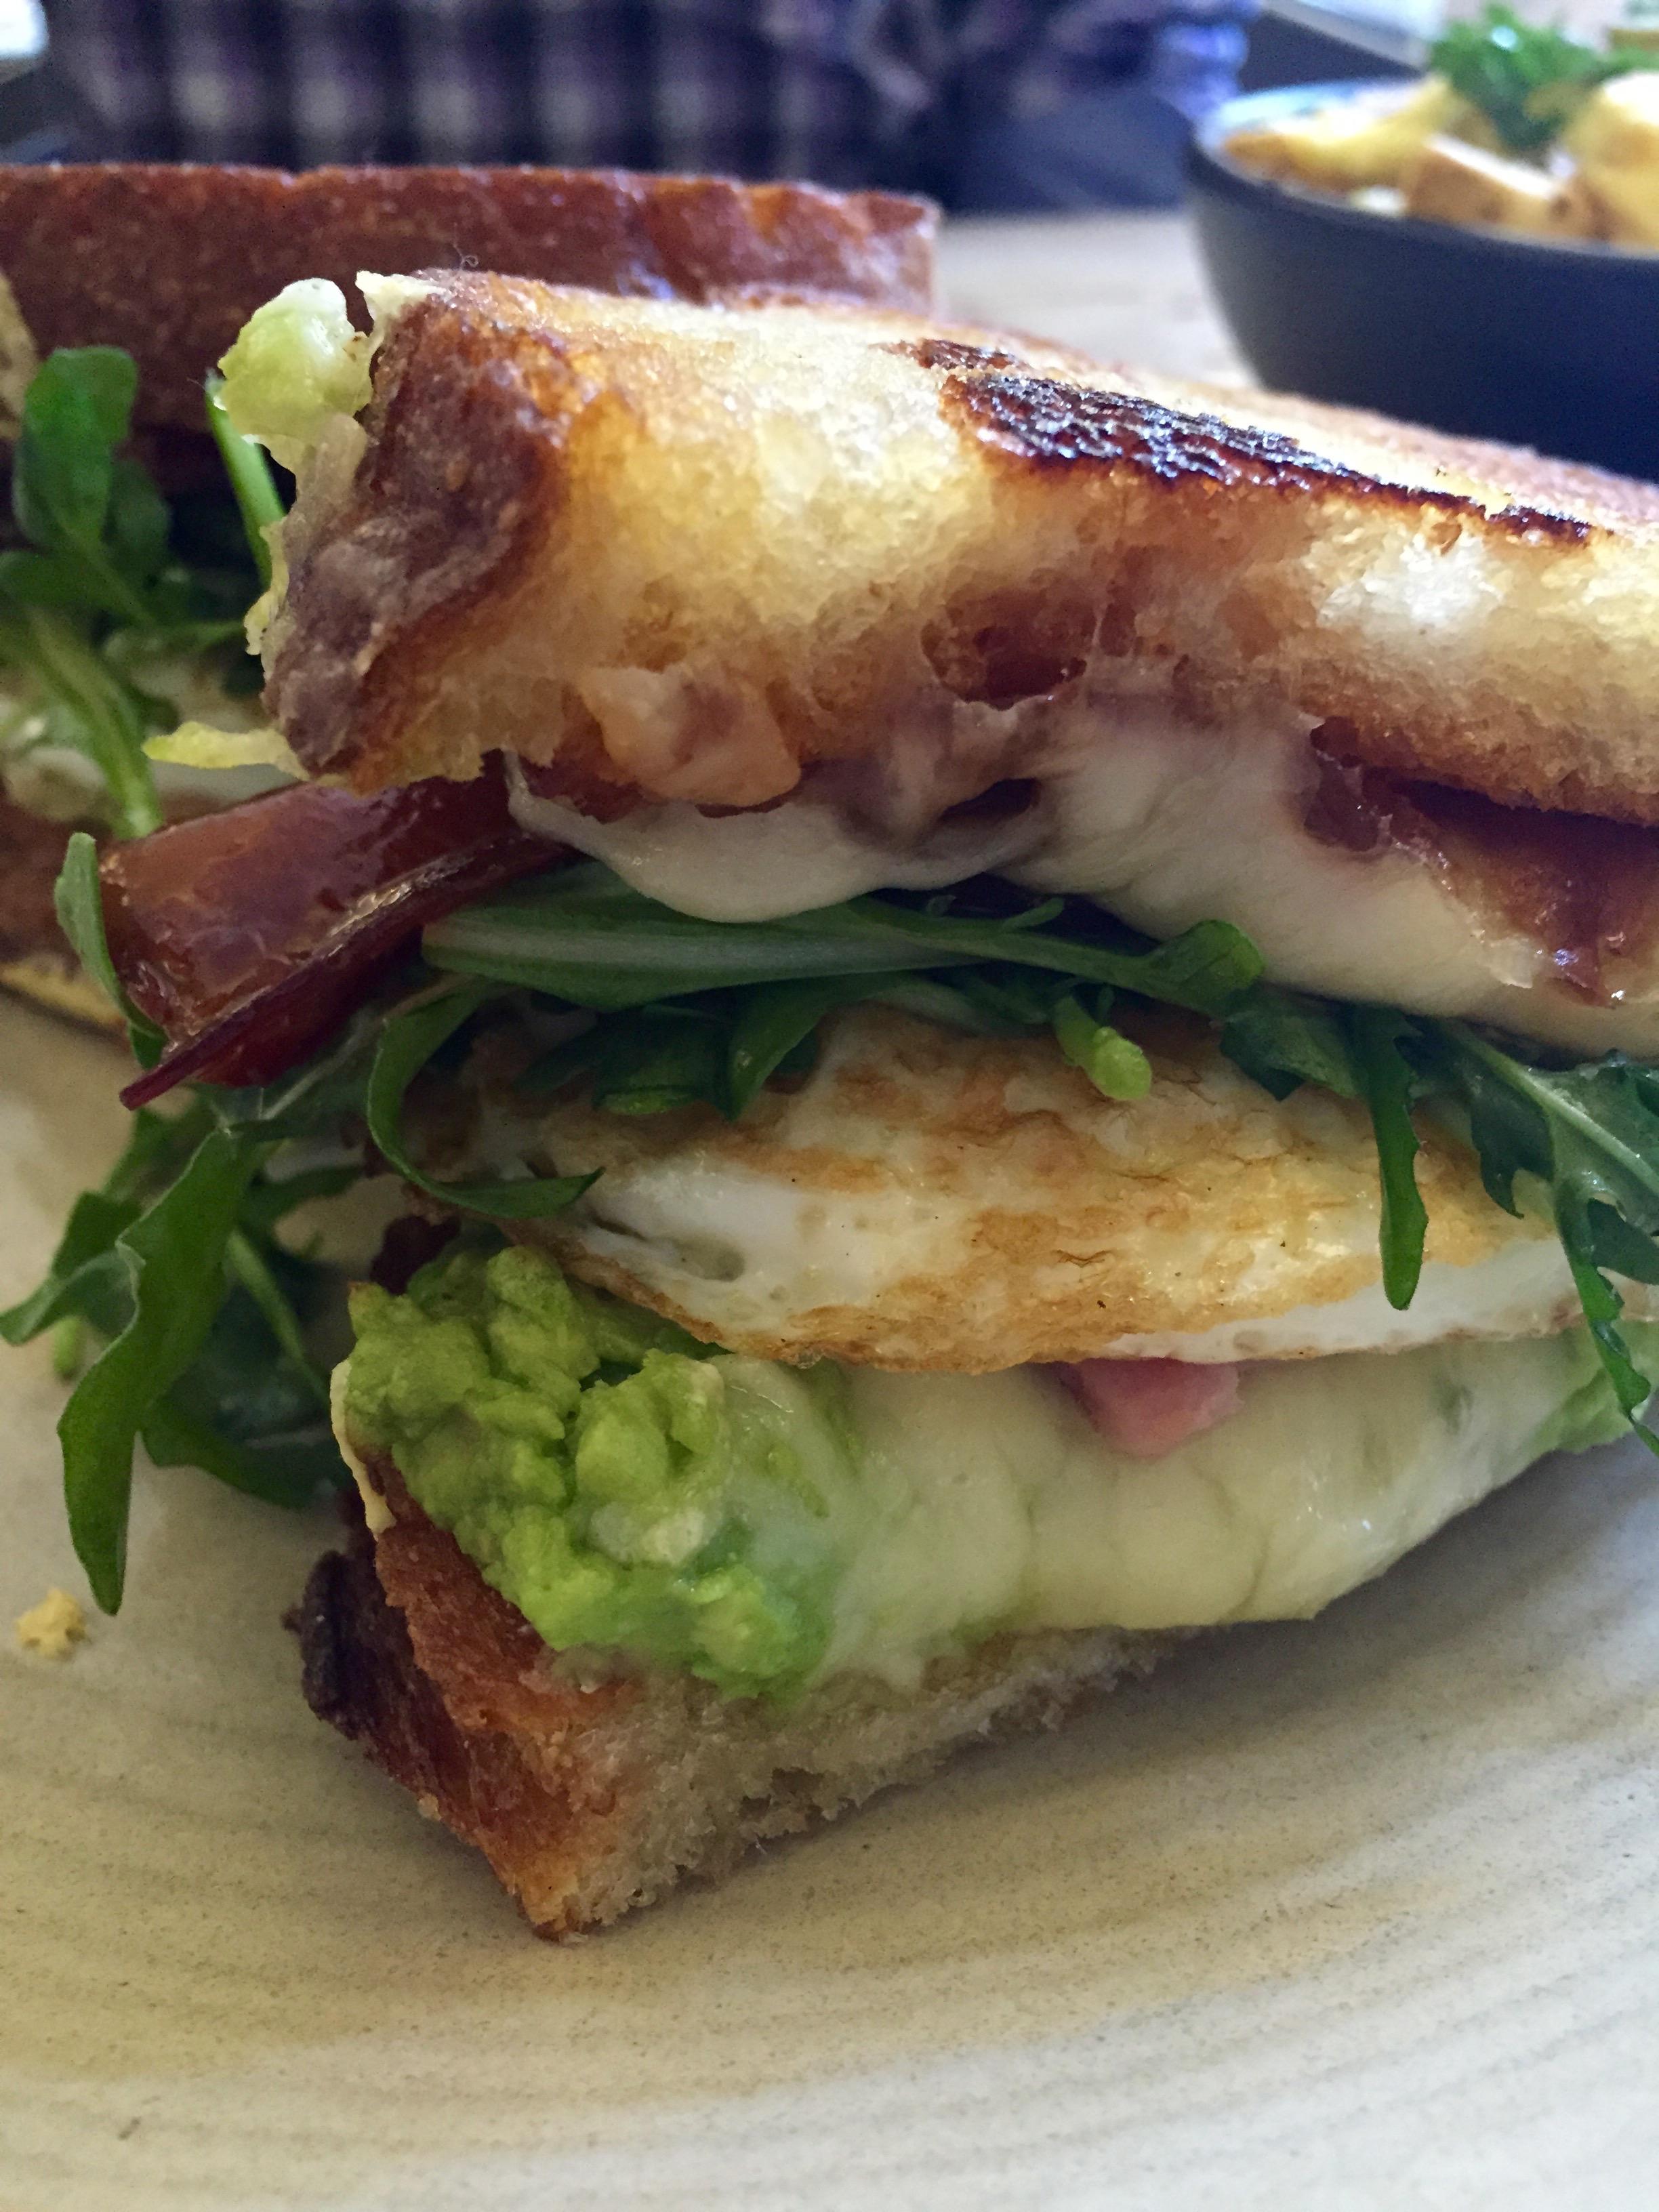 Littlefork Melt with Maple Bacon, ham, onion marmalade, avocado, eggs over-easy, cheddar, and Jarlsberg.